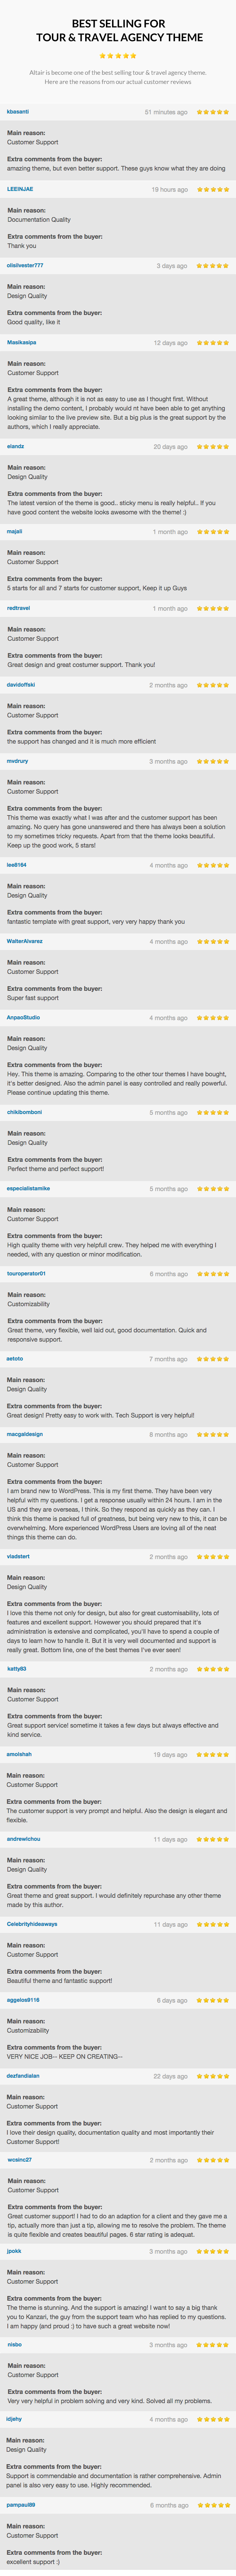 altair testimonials3 - Altair   Travel Agency WordPress